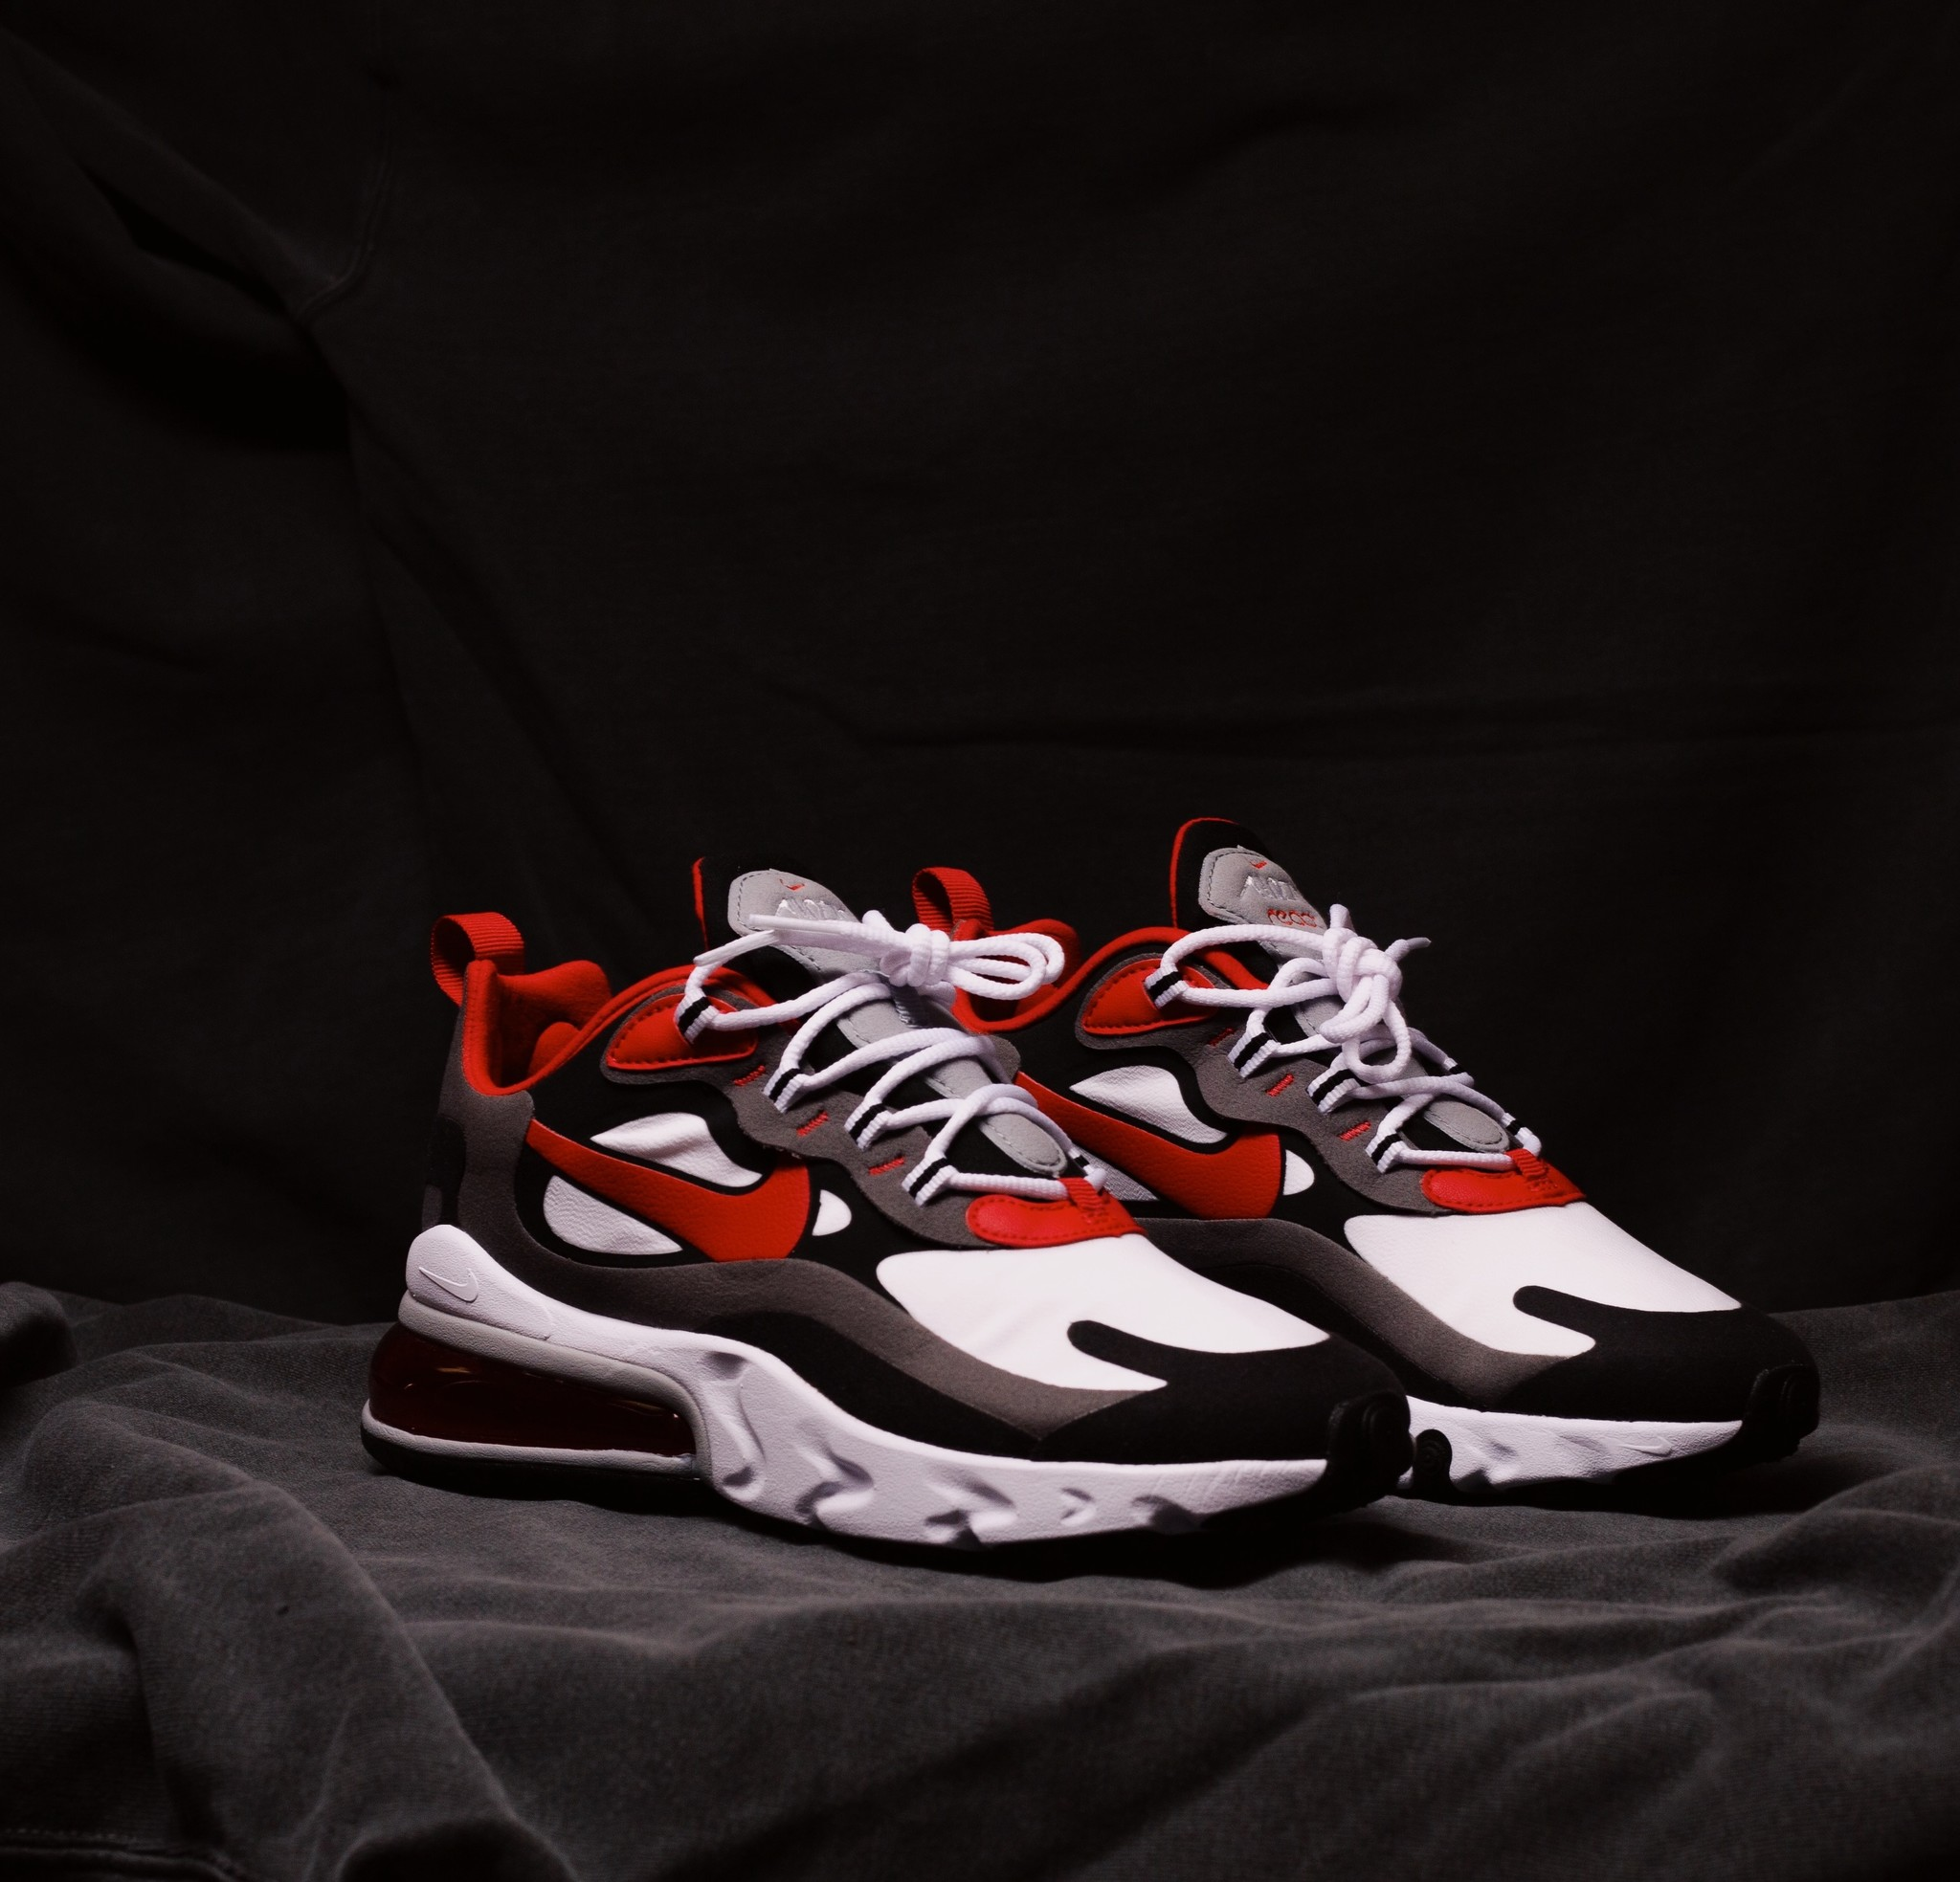 Nike Air Max 270 React Black/University Red